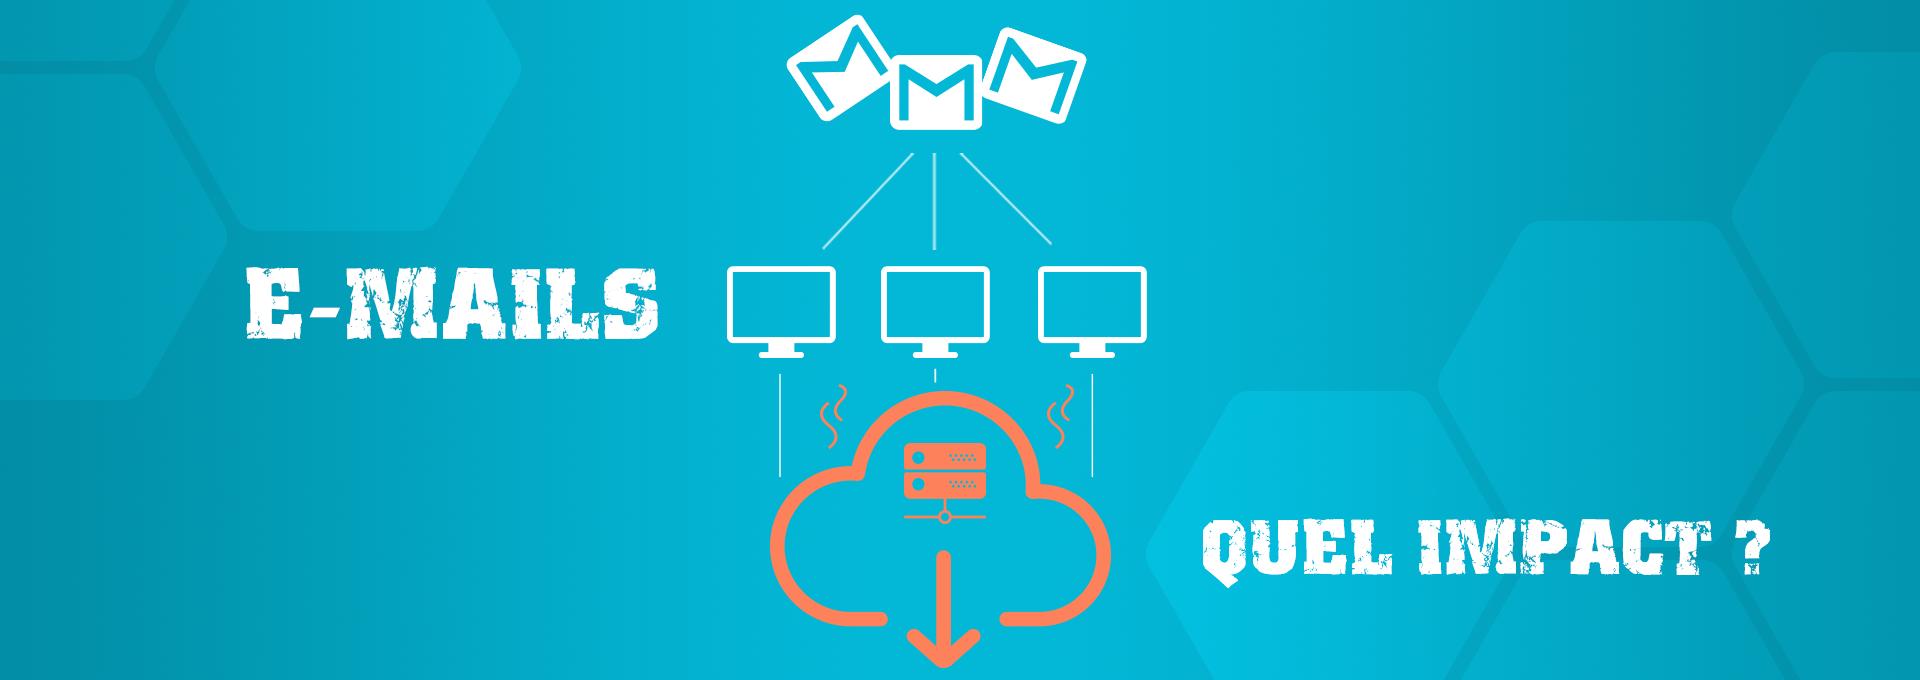 energie emails quel impact ?